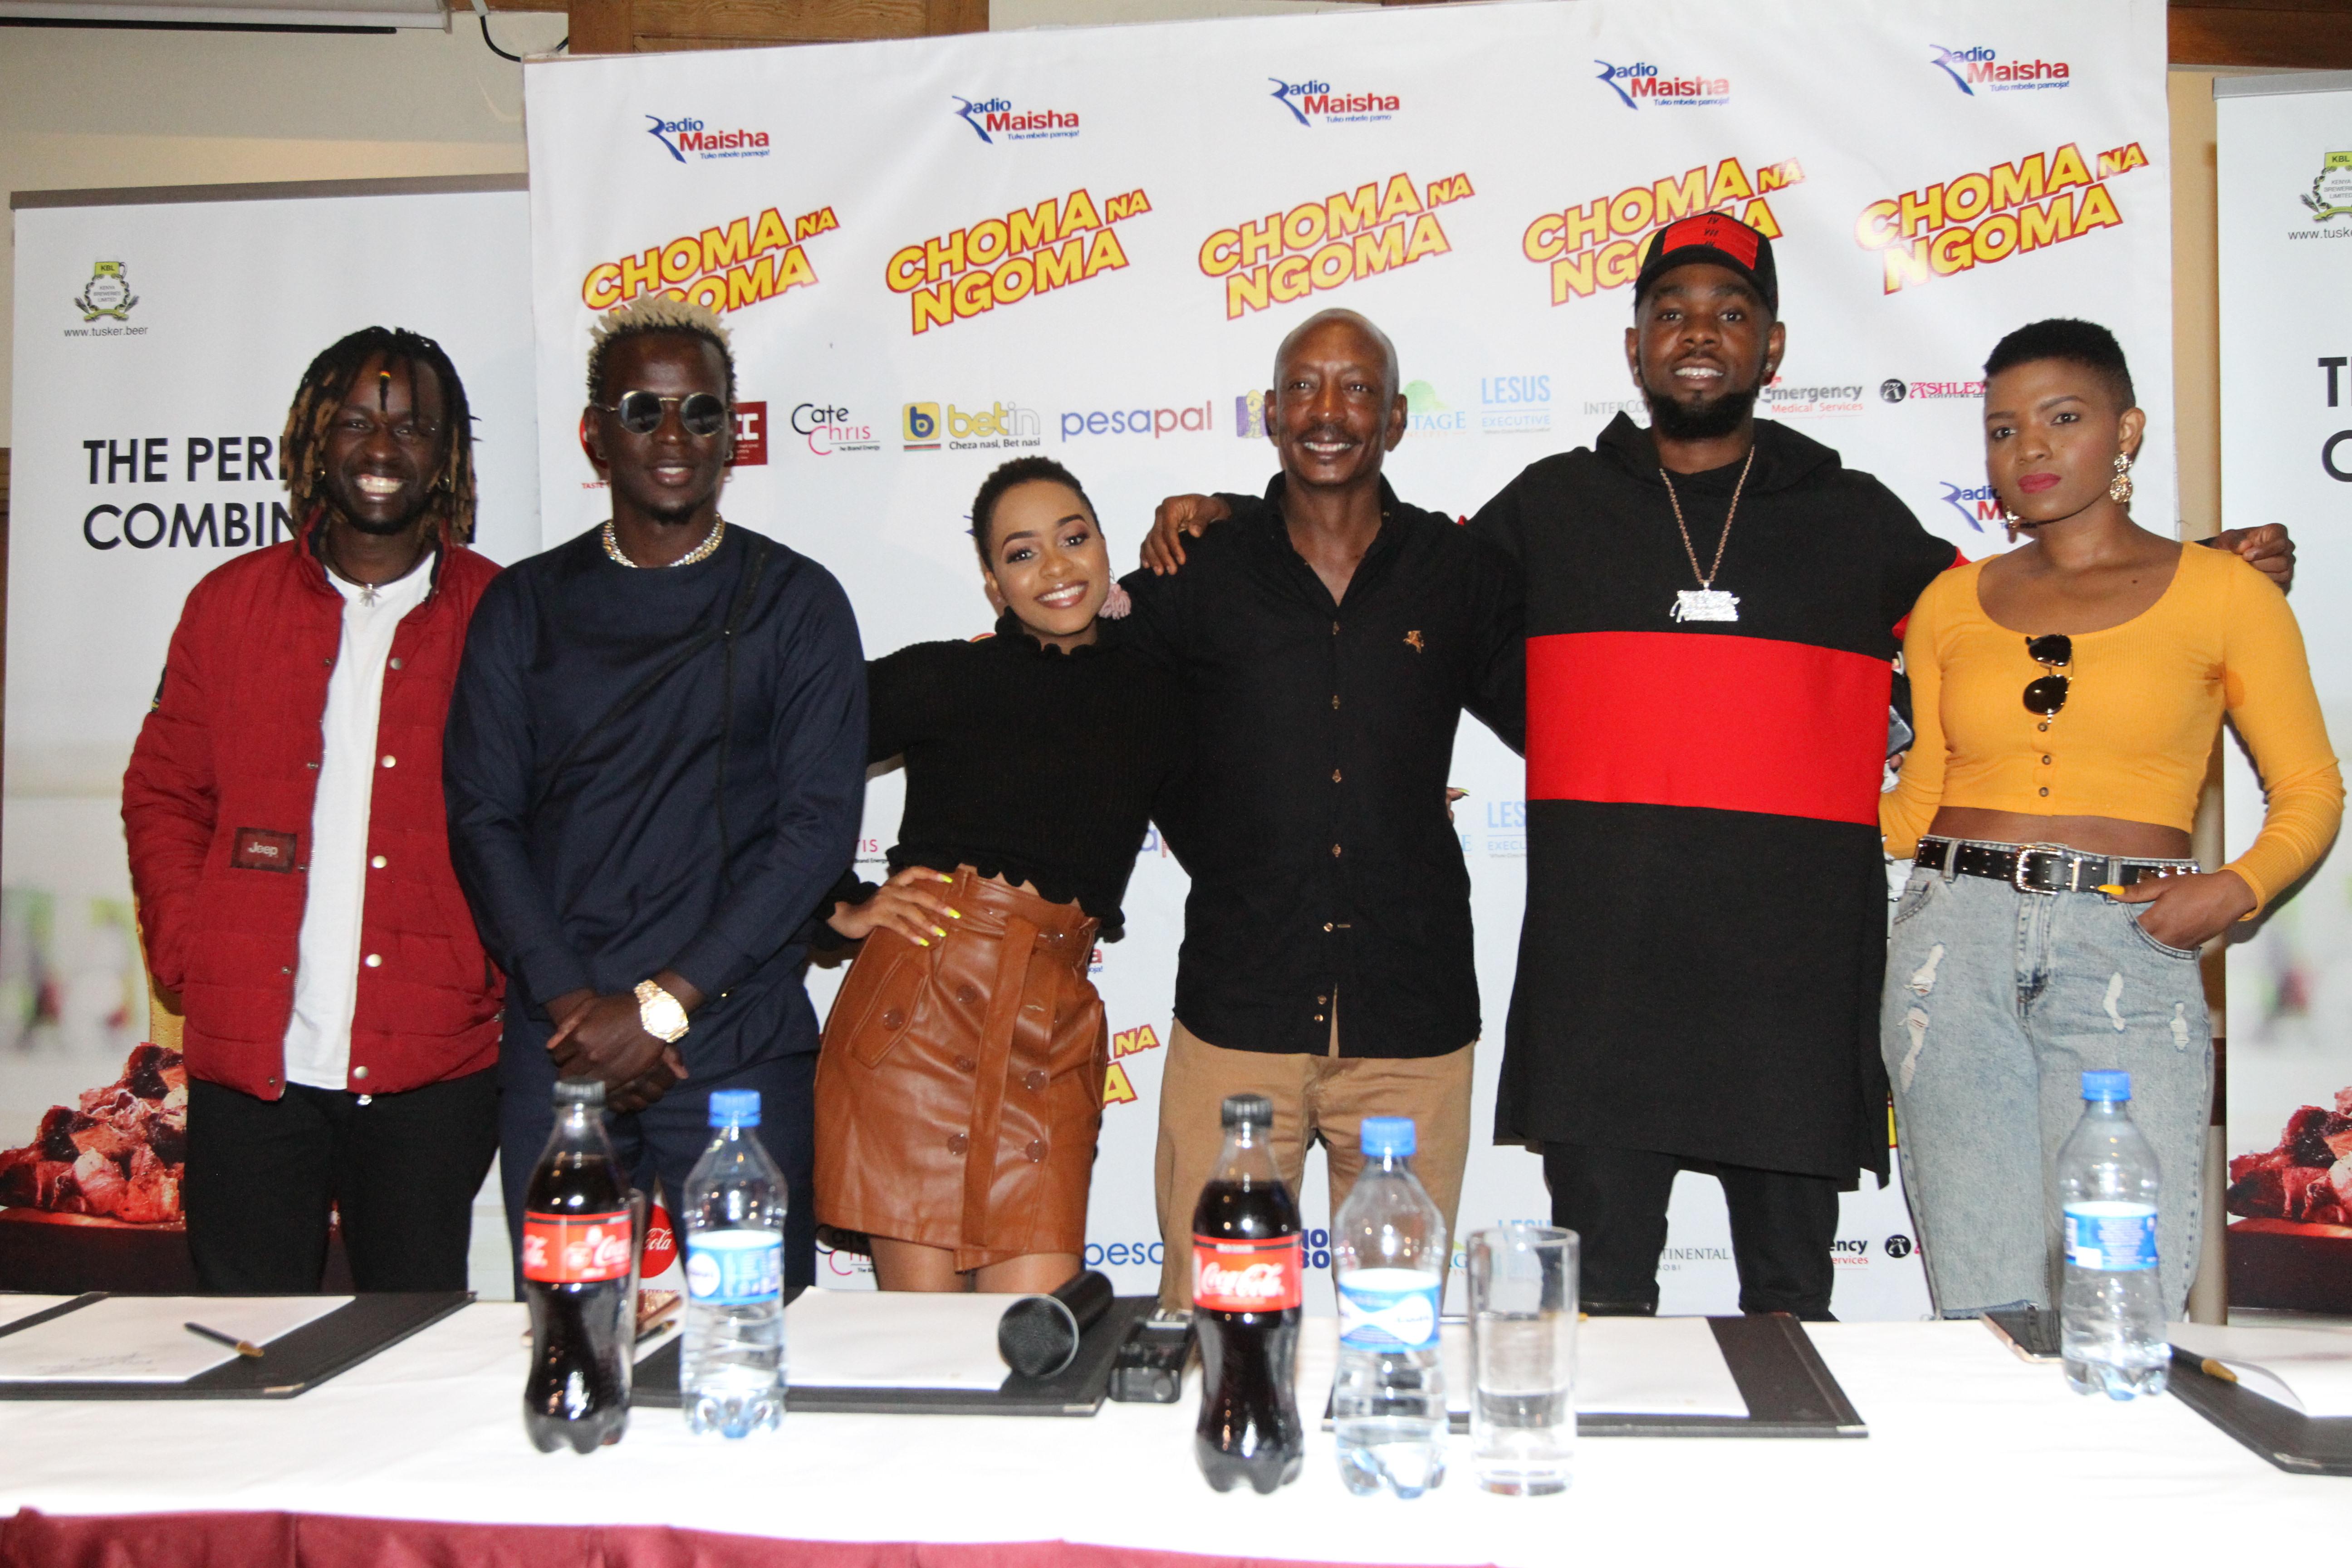 Choma na Ngoma Performers